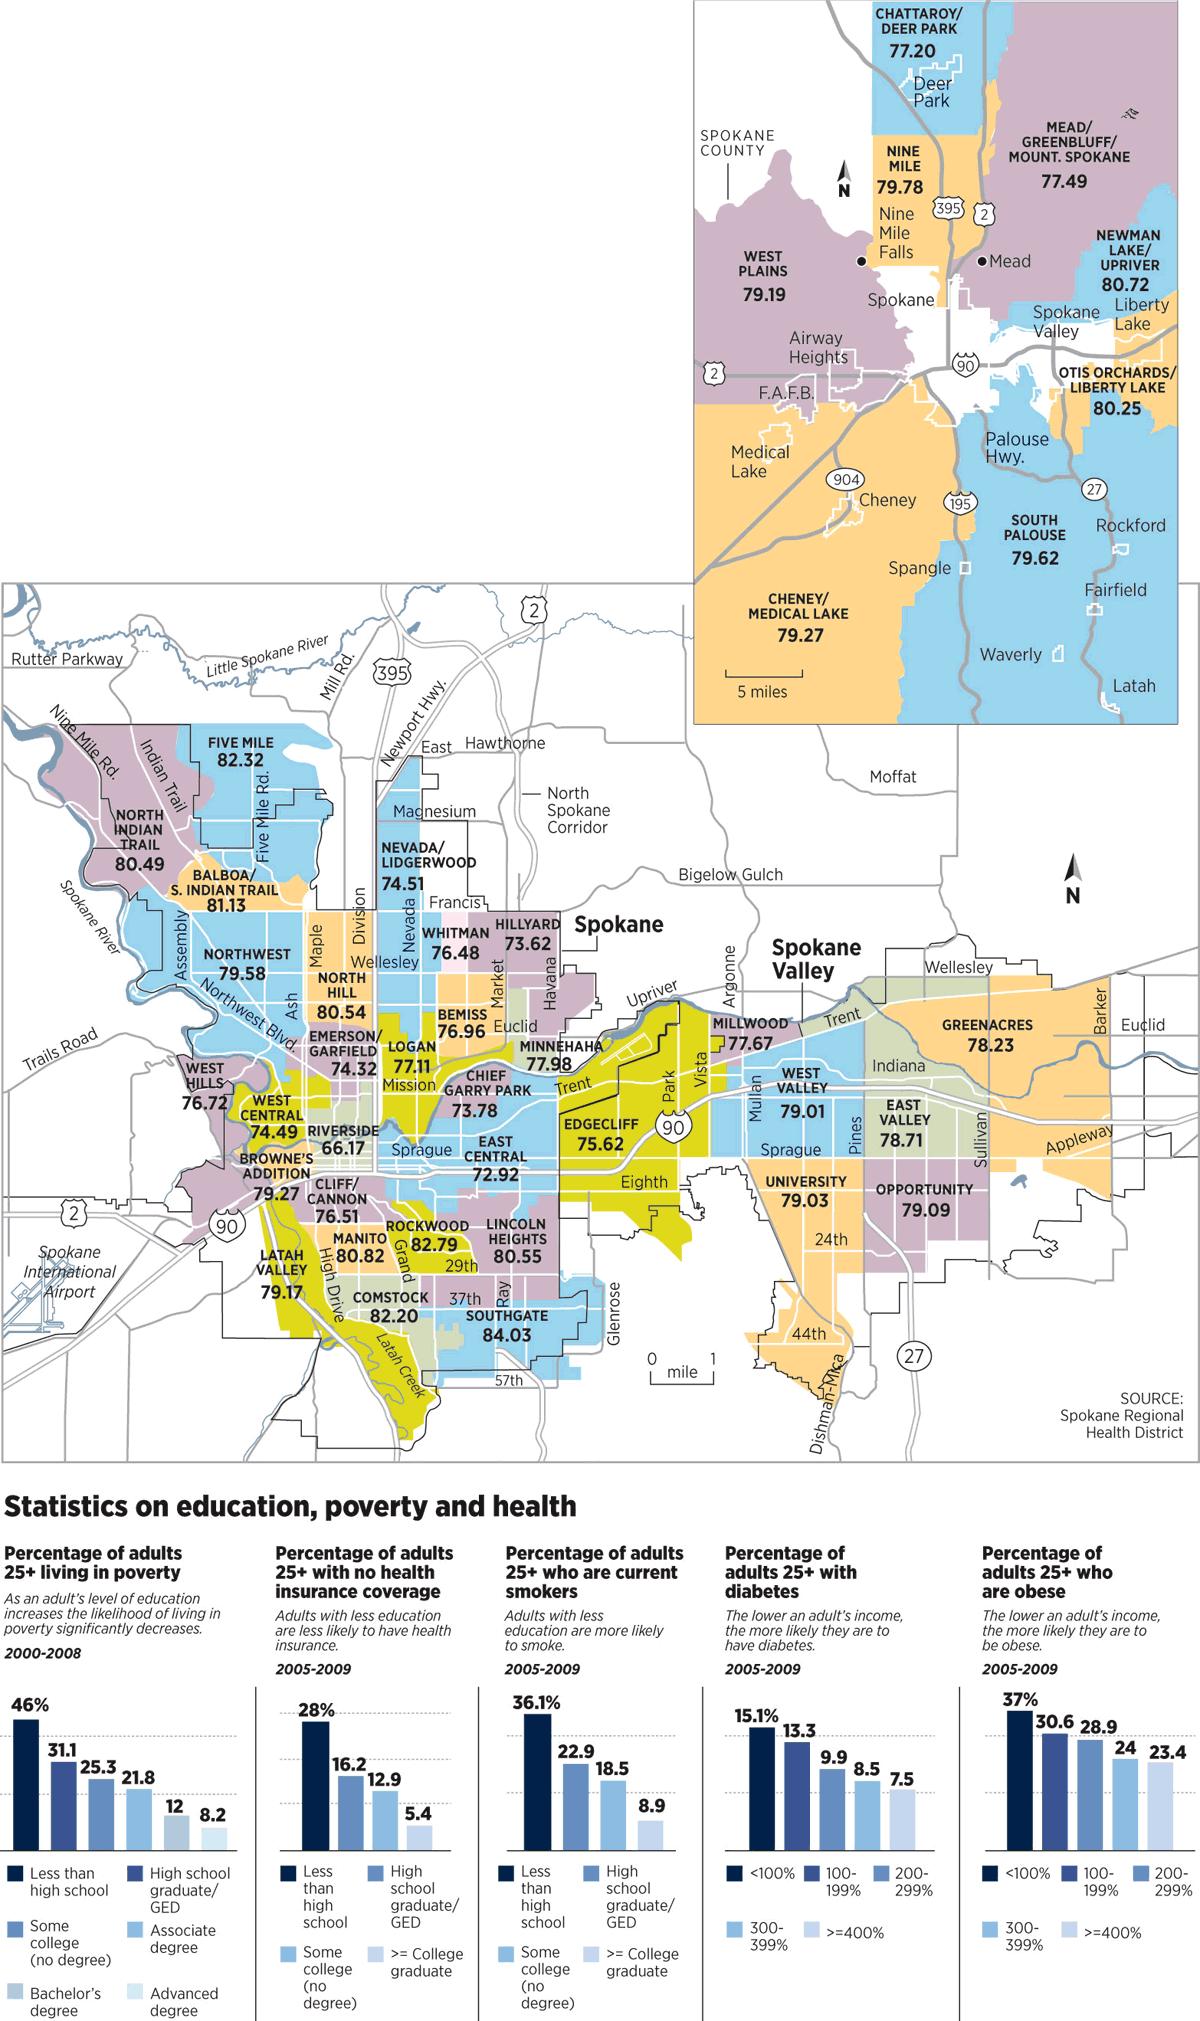 Spokane County Spokane Valley Medical Lake